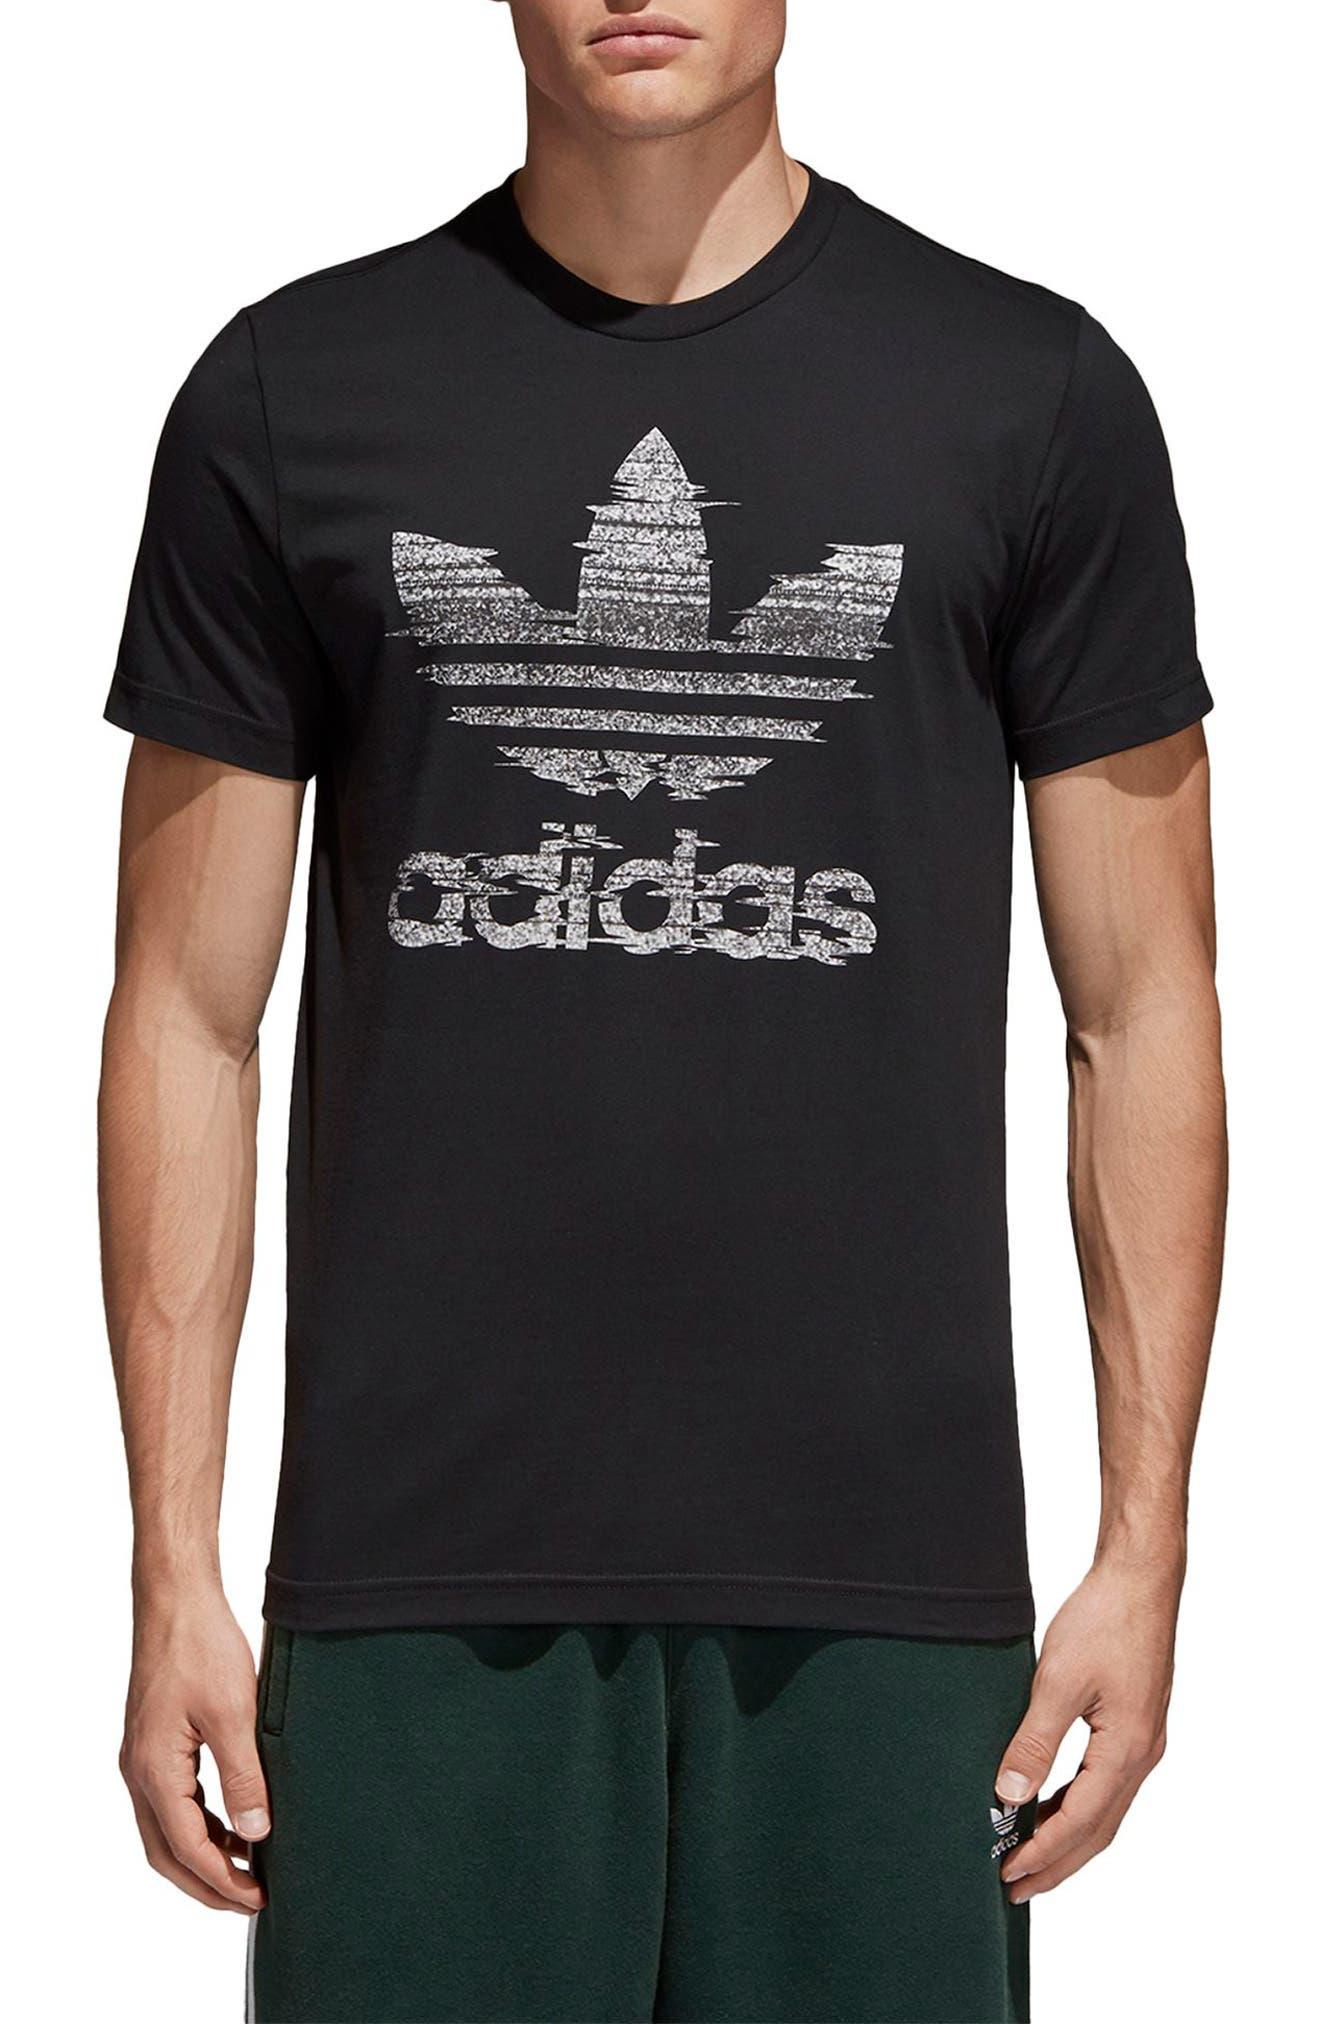 adidas Originals Traction Trefoil Graphic T-Shirt